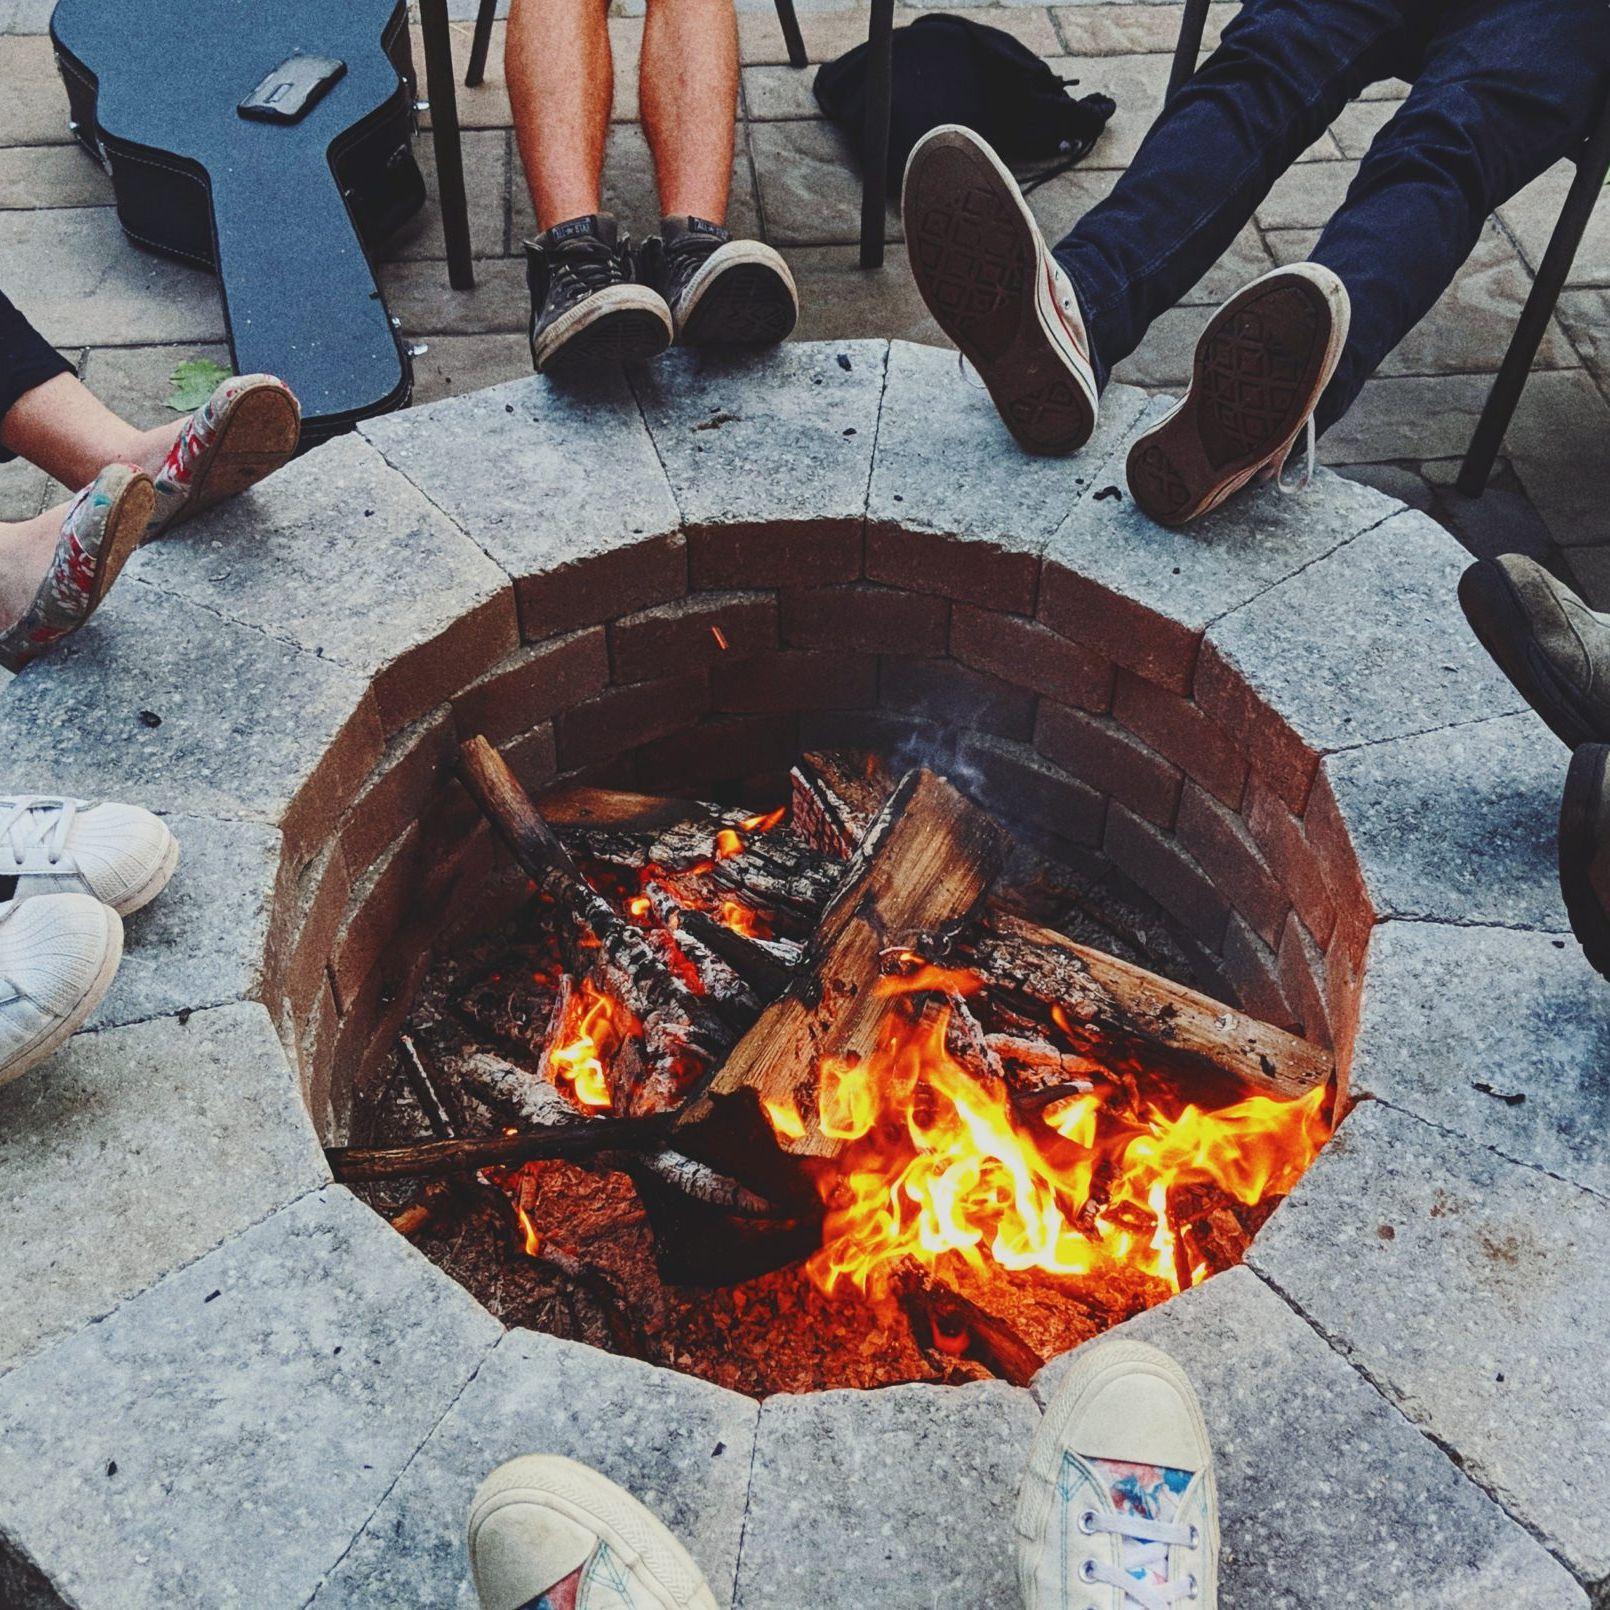 Sharing The Digital Campfire